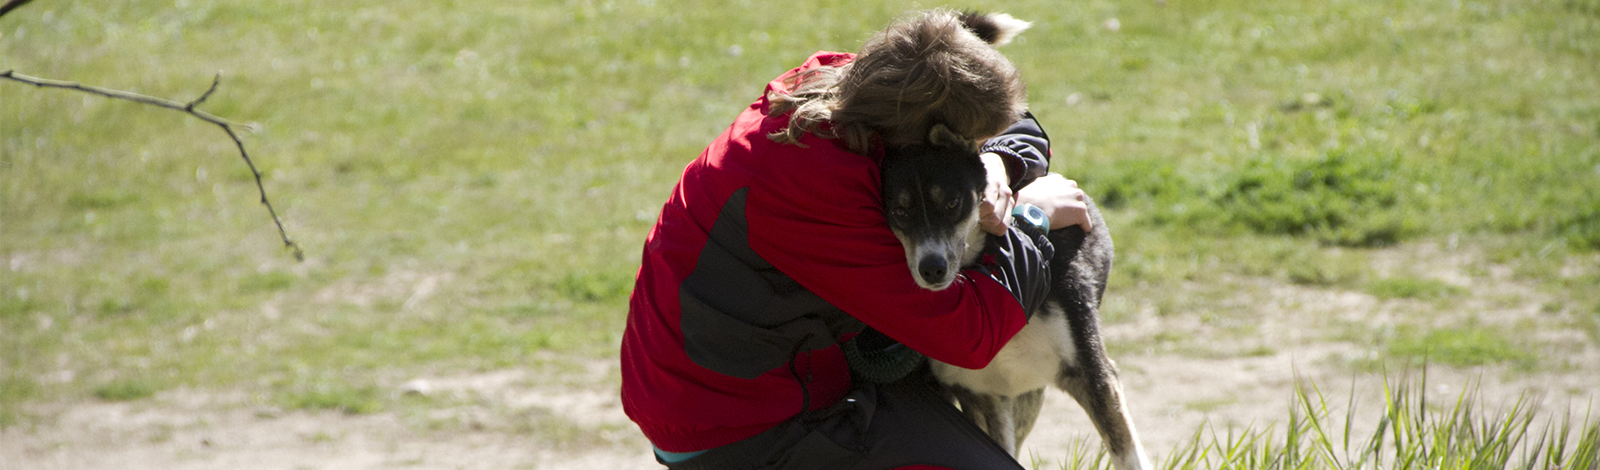 Terapia_asistida_con_animales_0024_humanymal